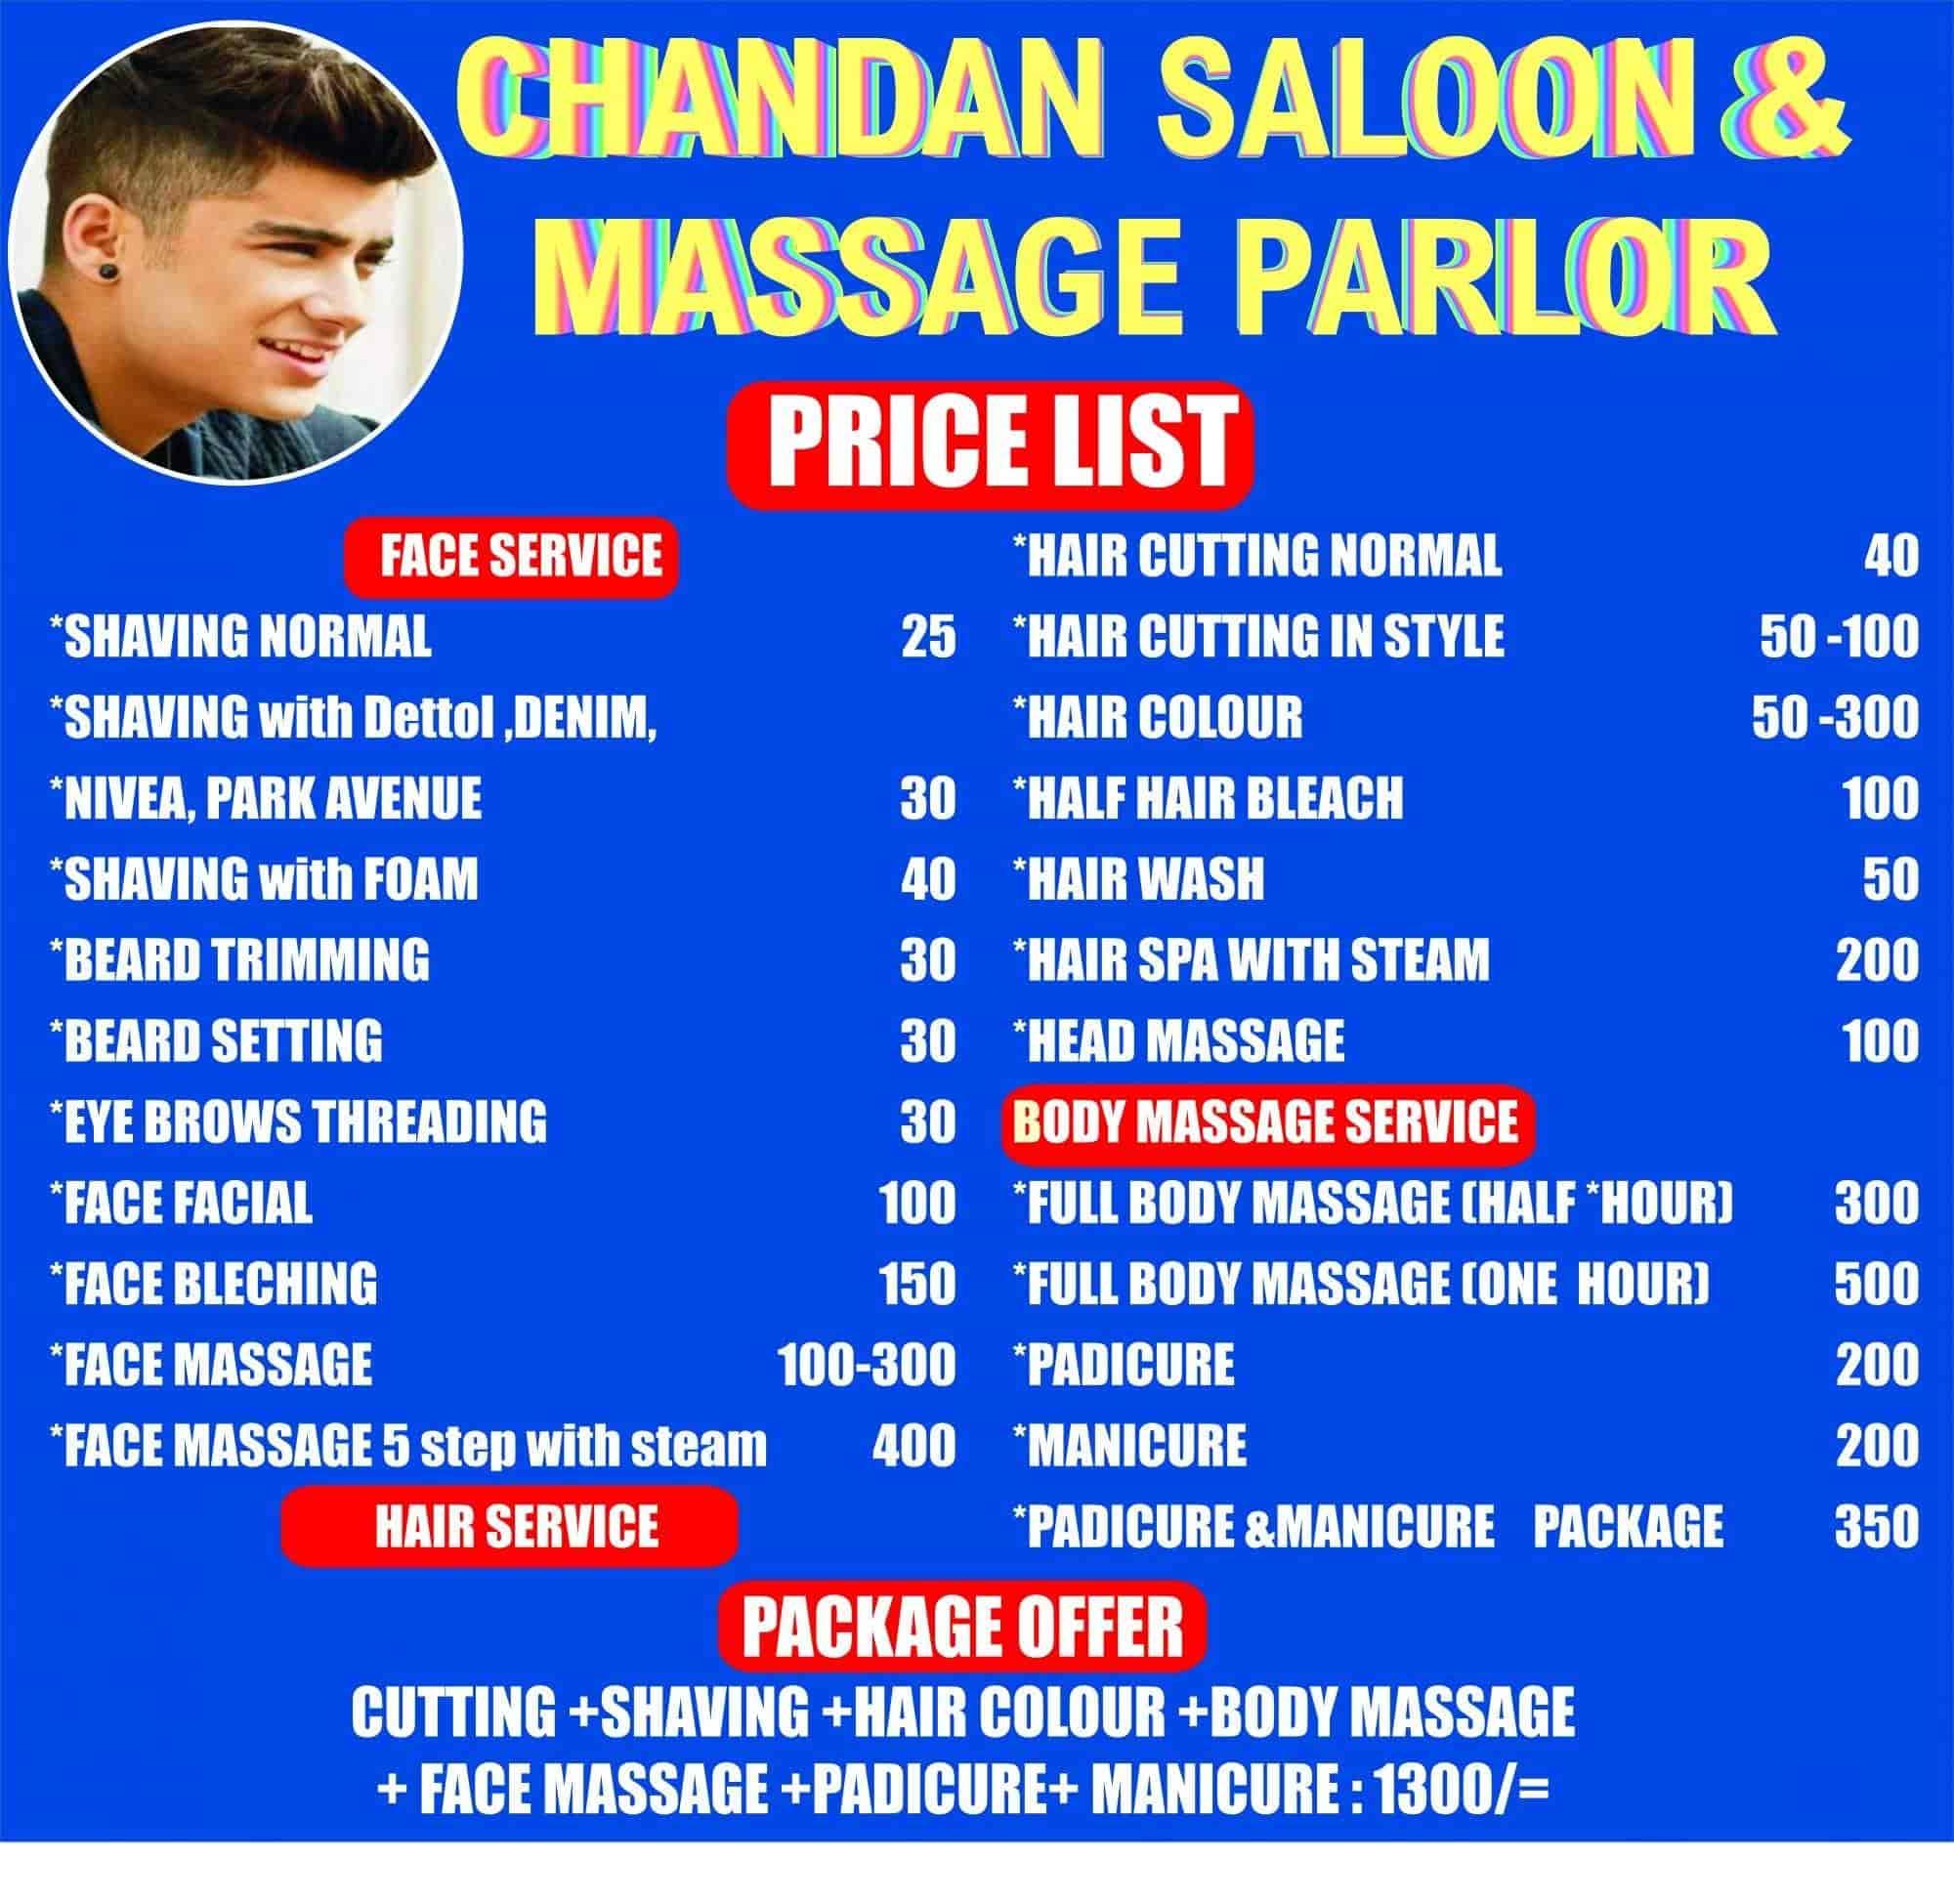 Chandan Saloon & Massage Parlour, Aliganj - Body Massage